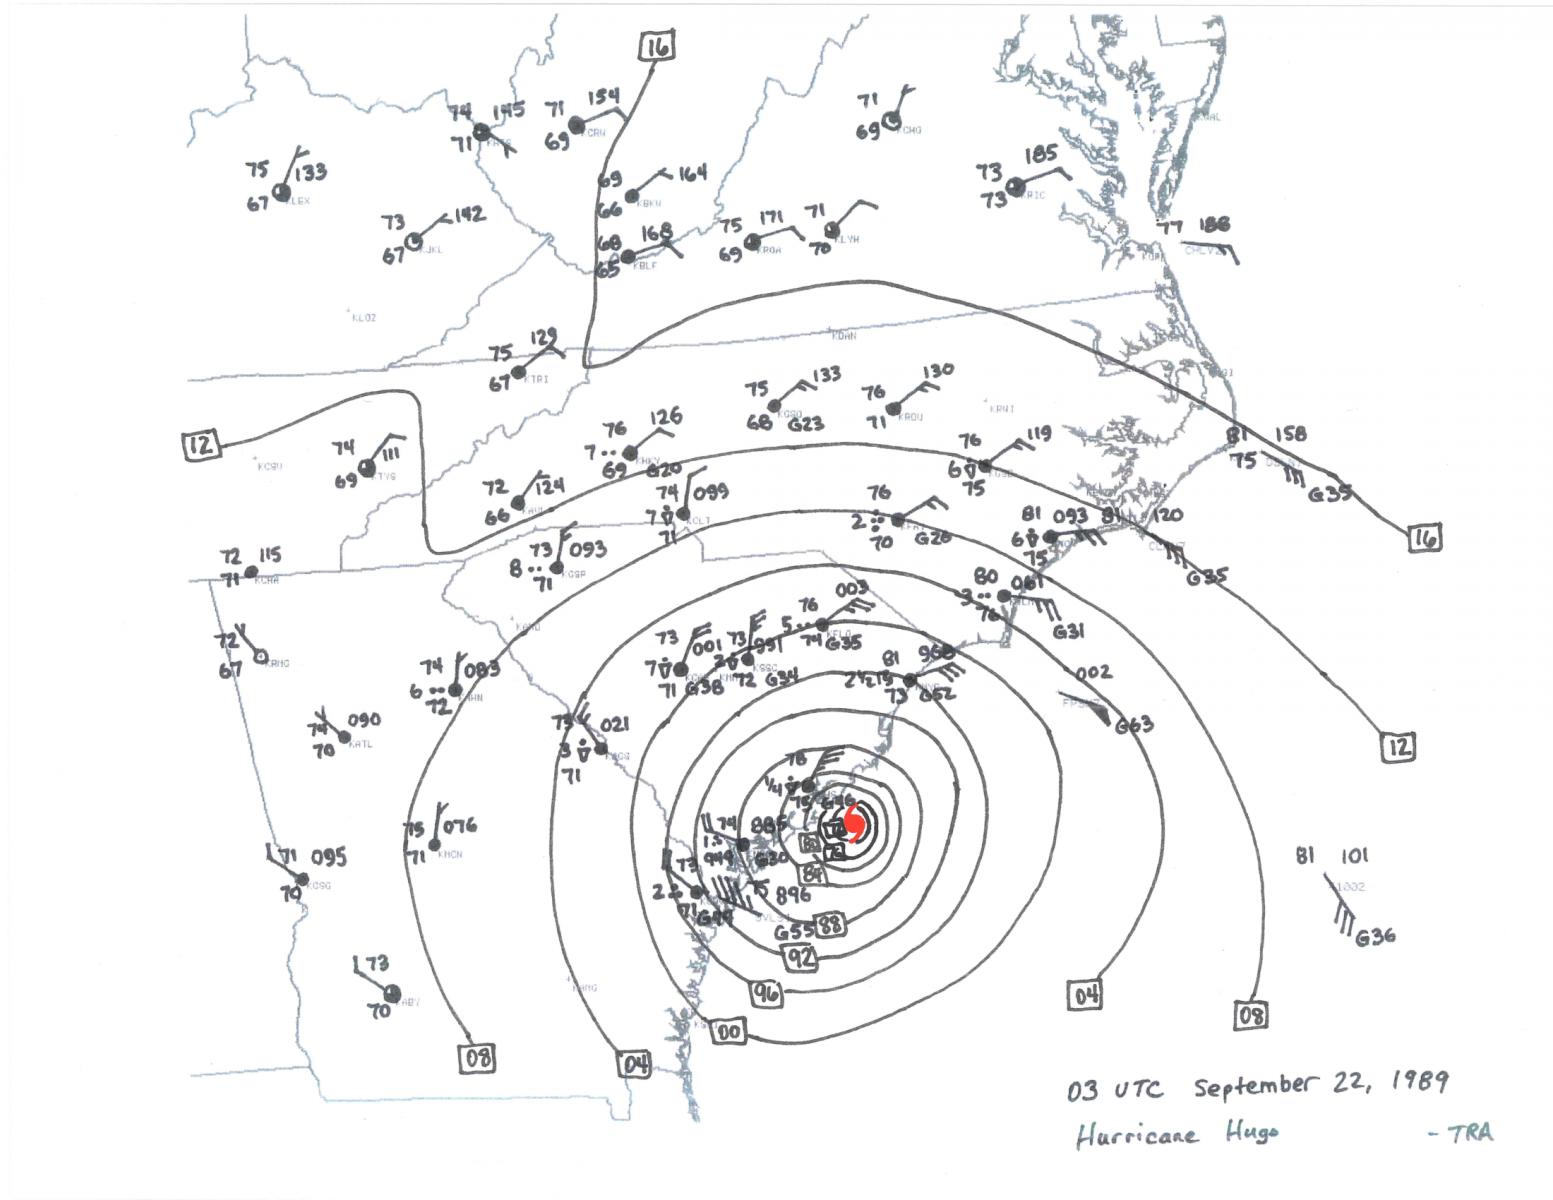 hurricane hugo 3.8 Liter Dodge Engine Diagram sep 22 03z surface map